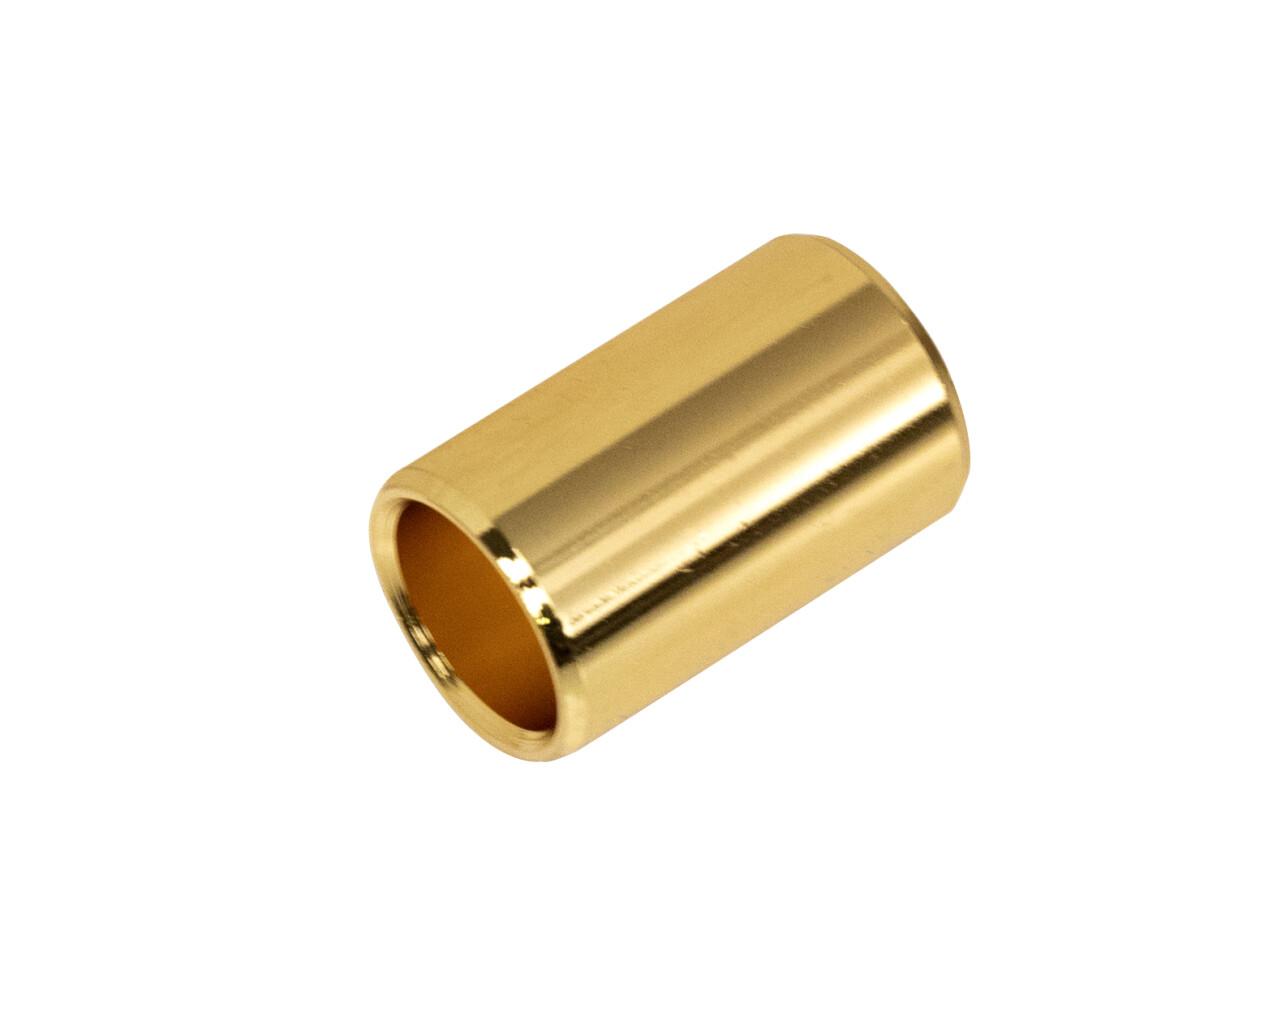 Copper slide 30-21